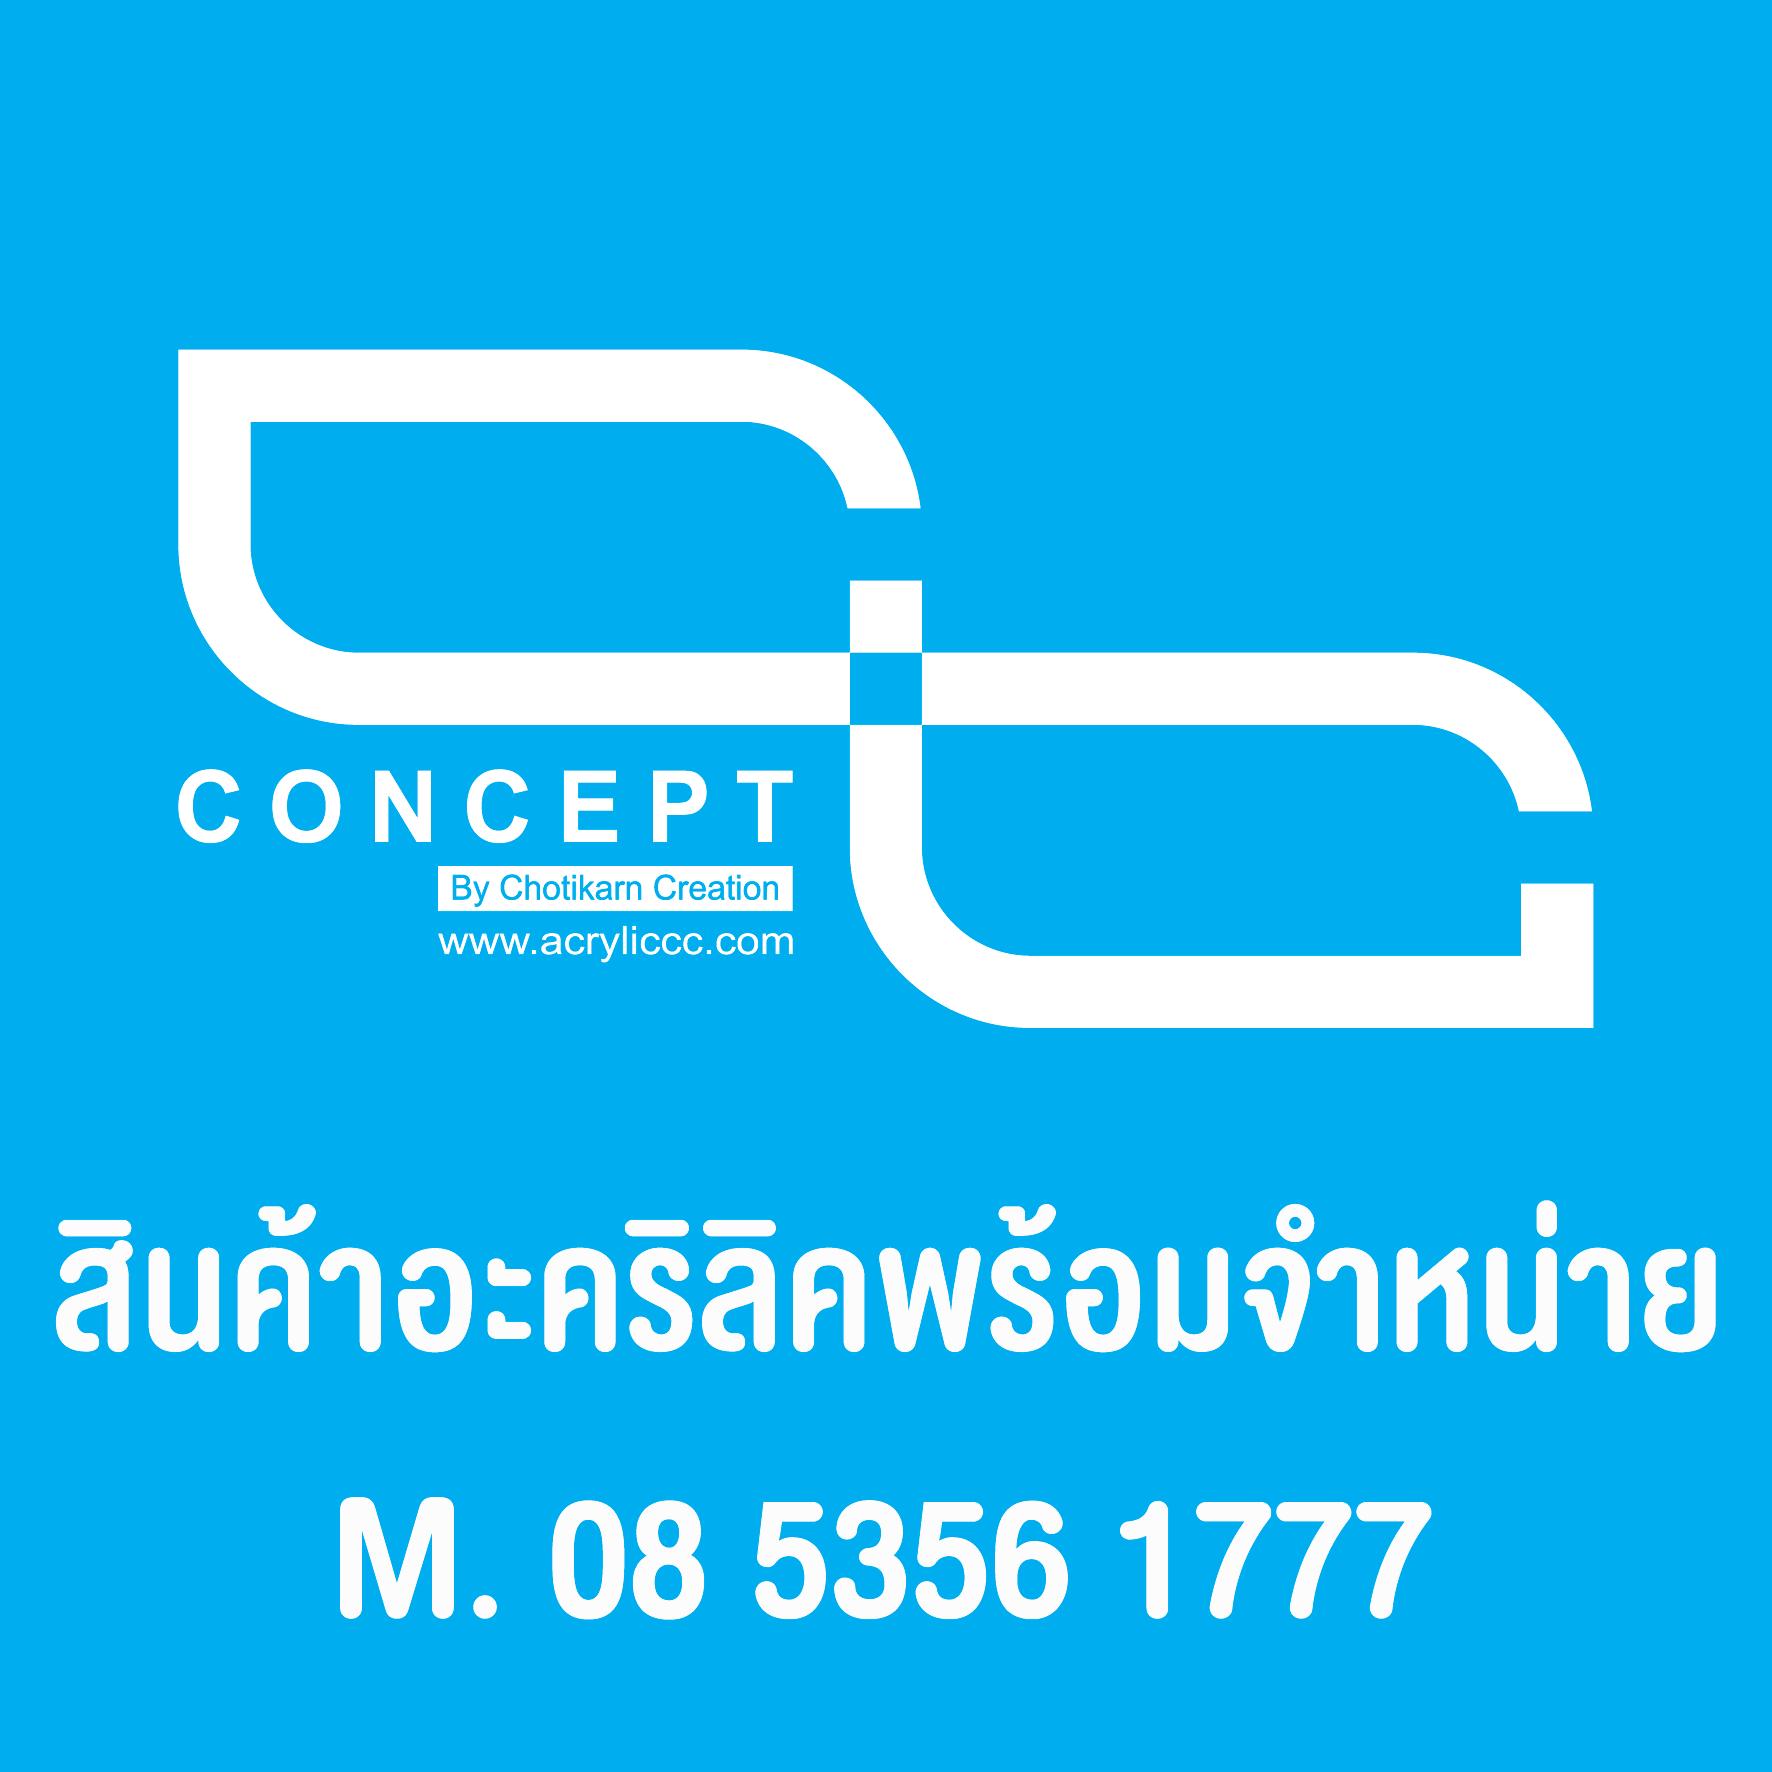 CC Concept